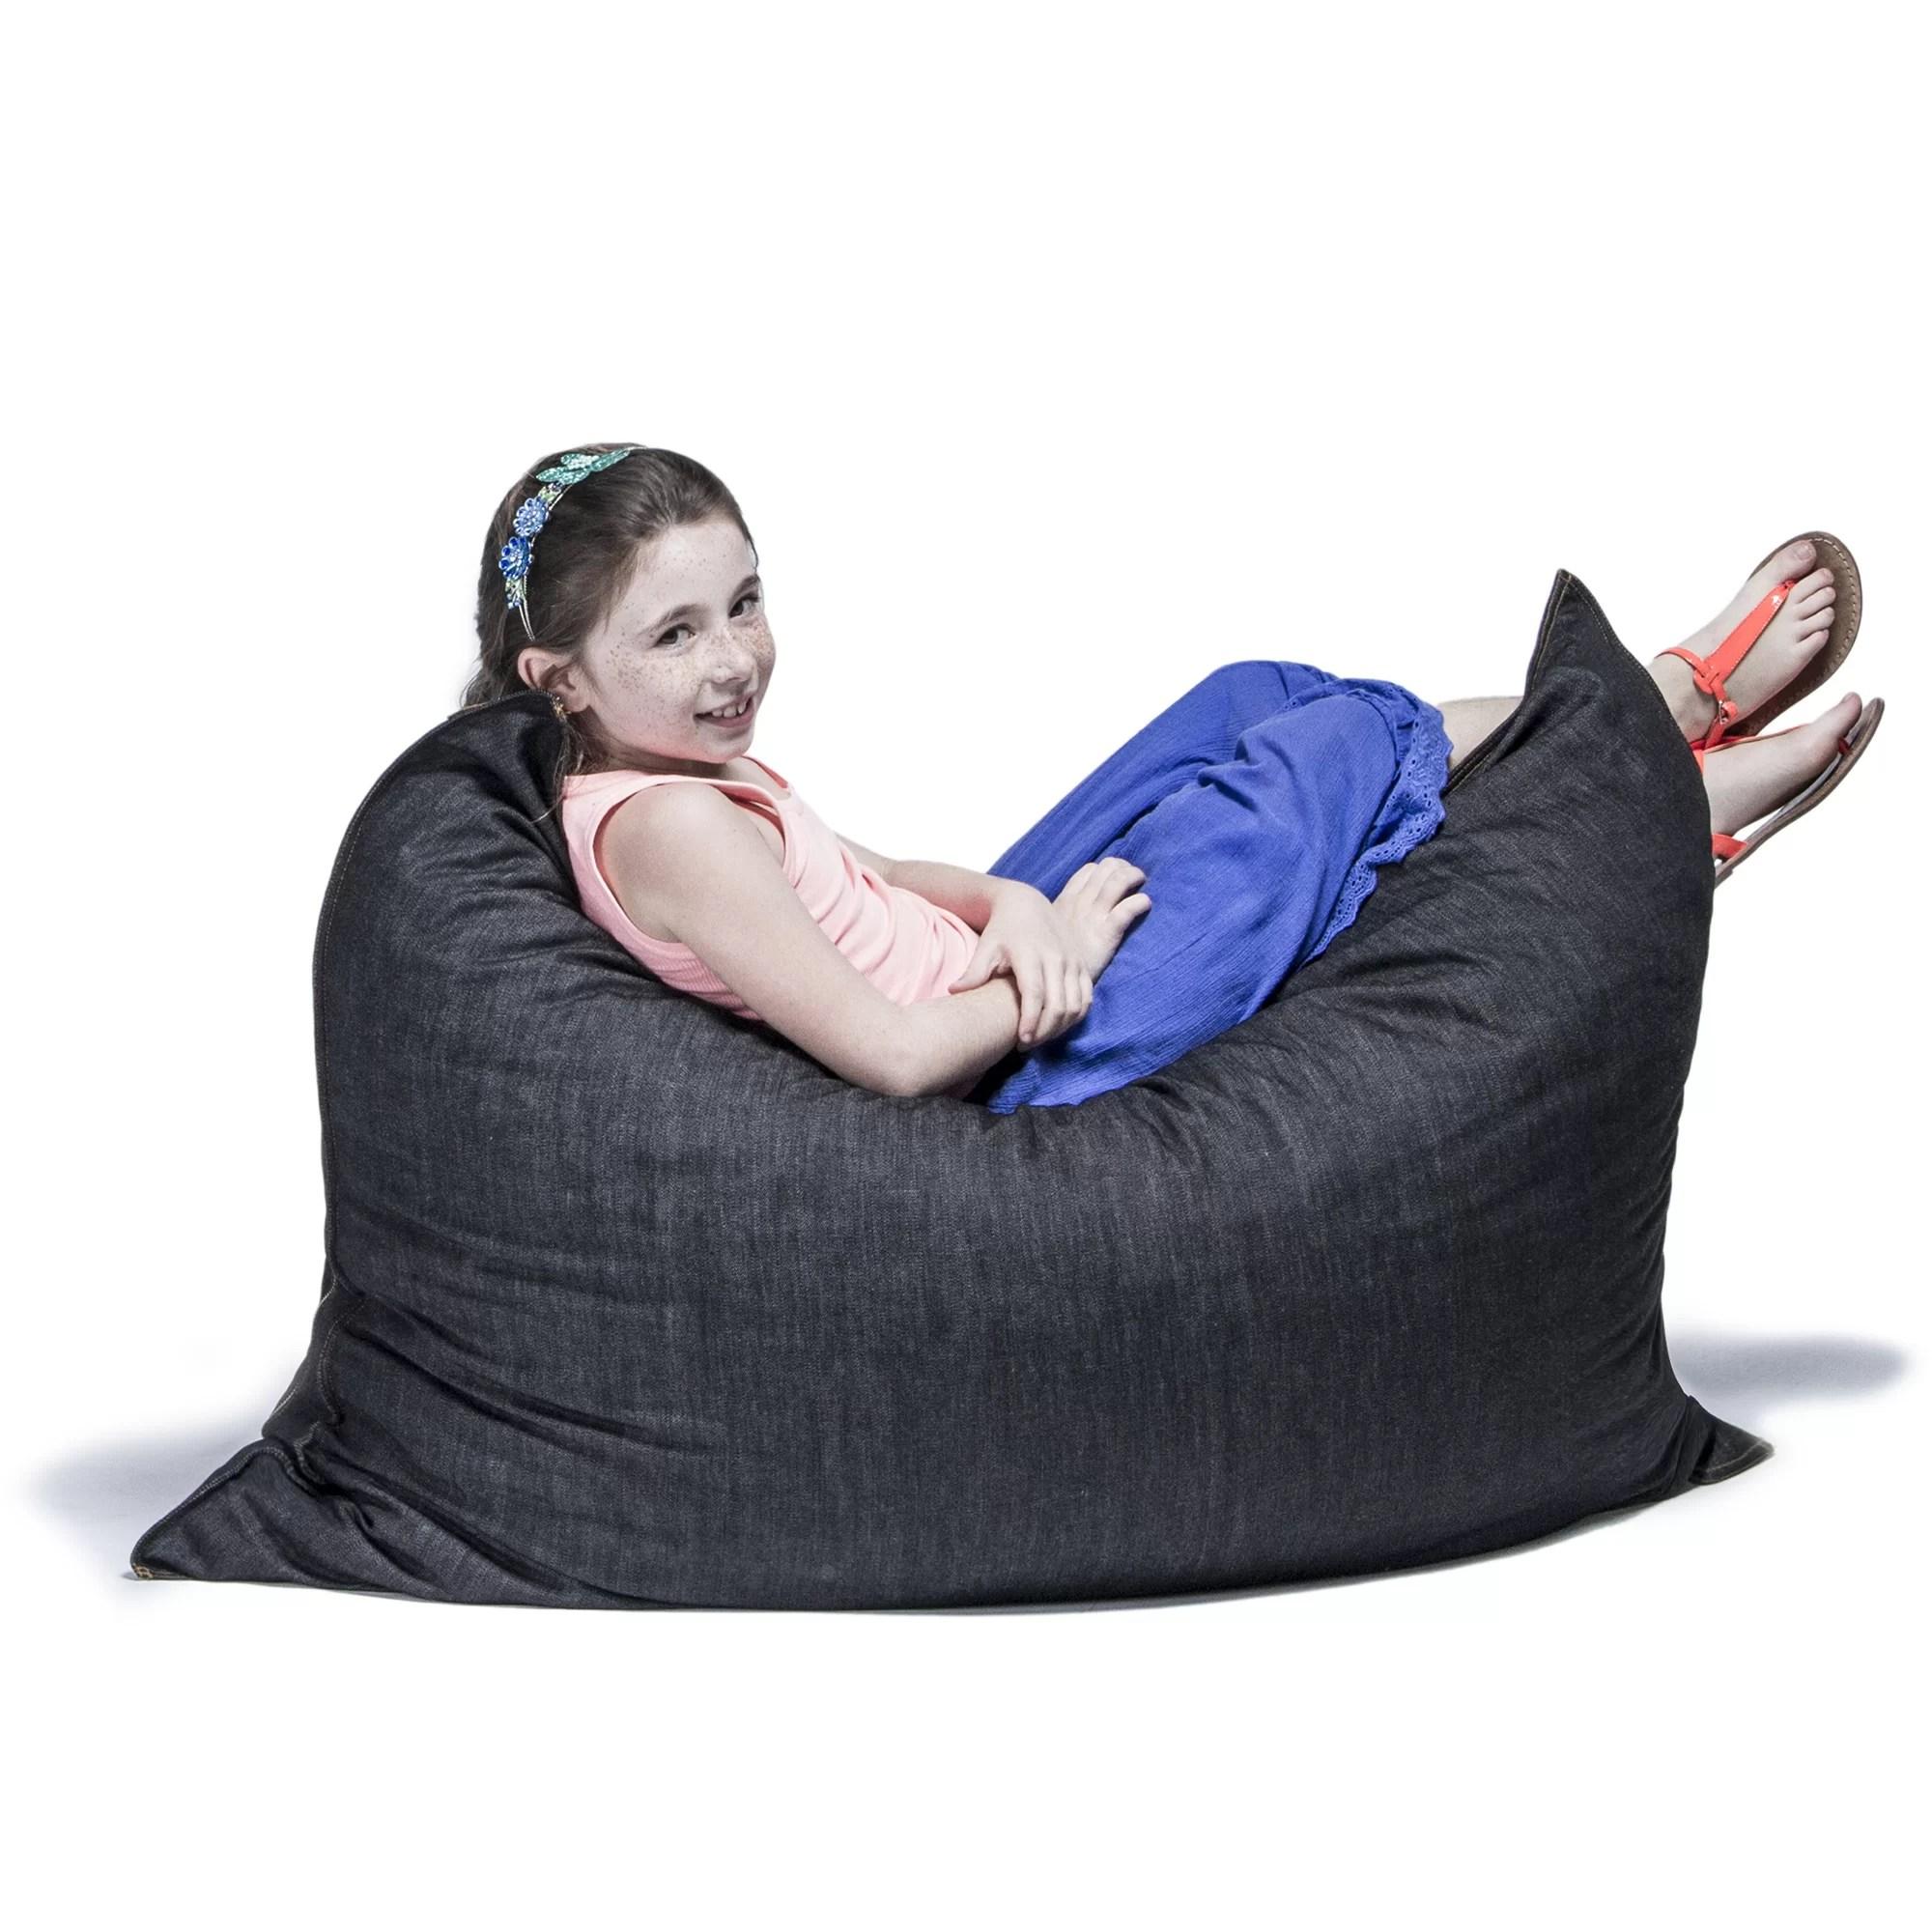 jaxx bean bag chair black velvet dining chairs denim 3 5 pillow saxx lounge and reviews